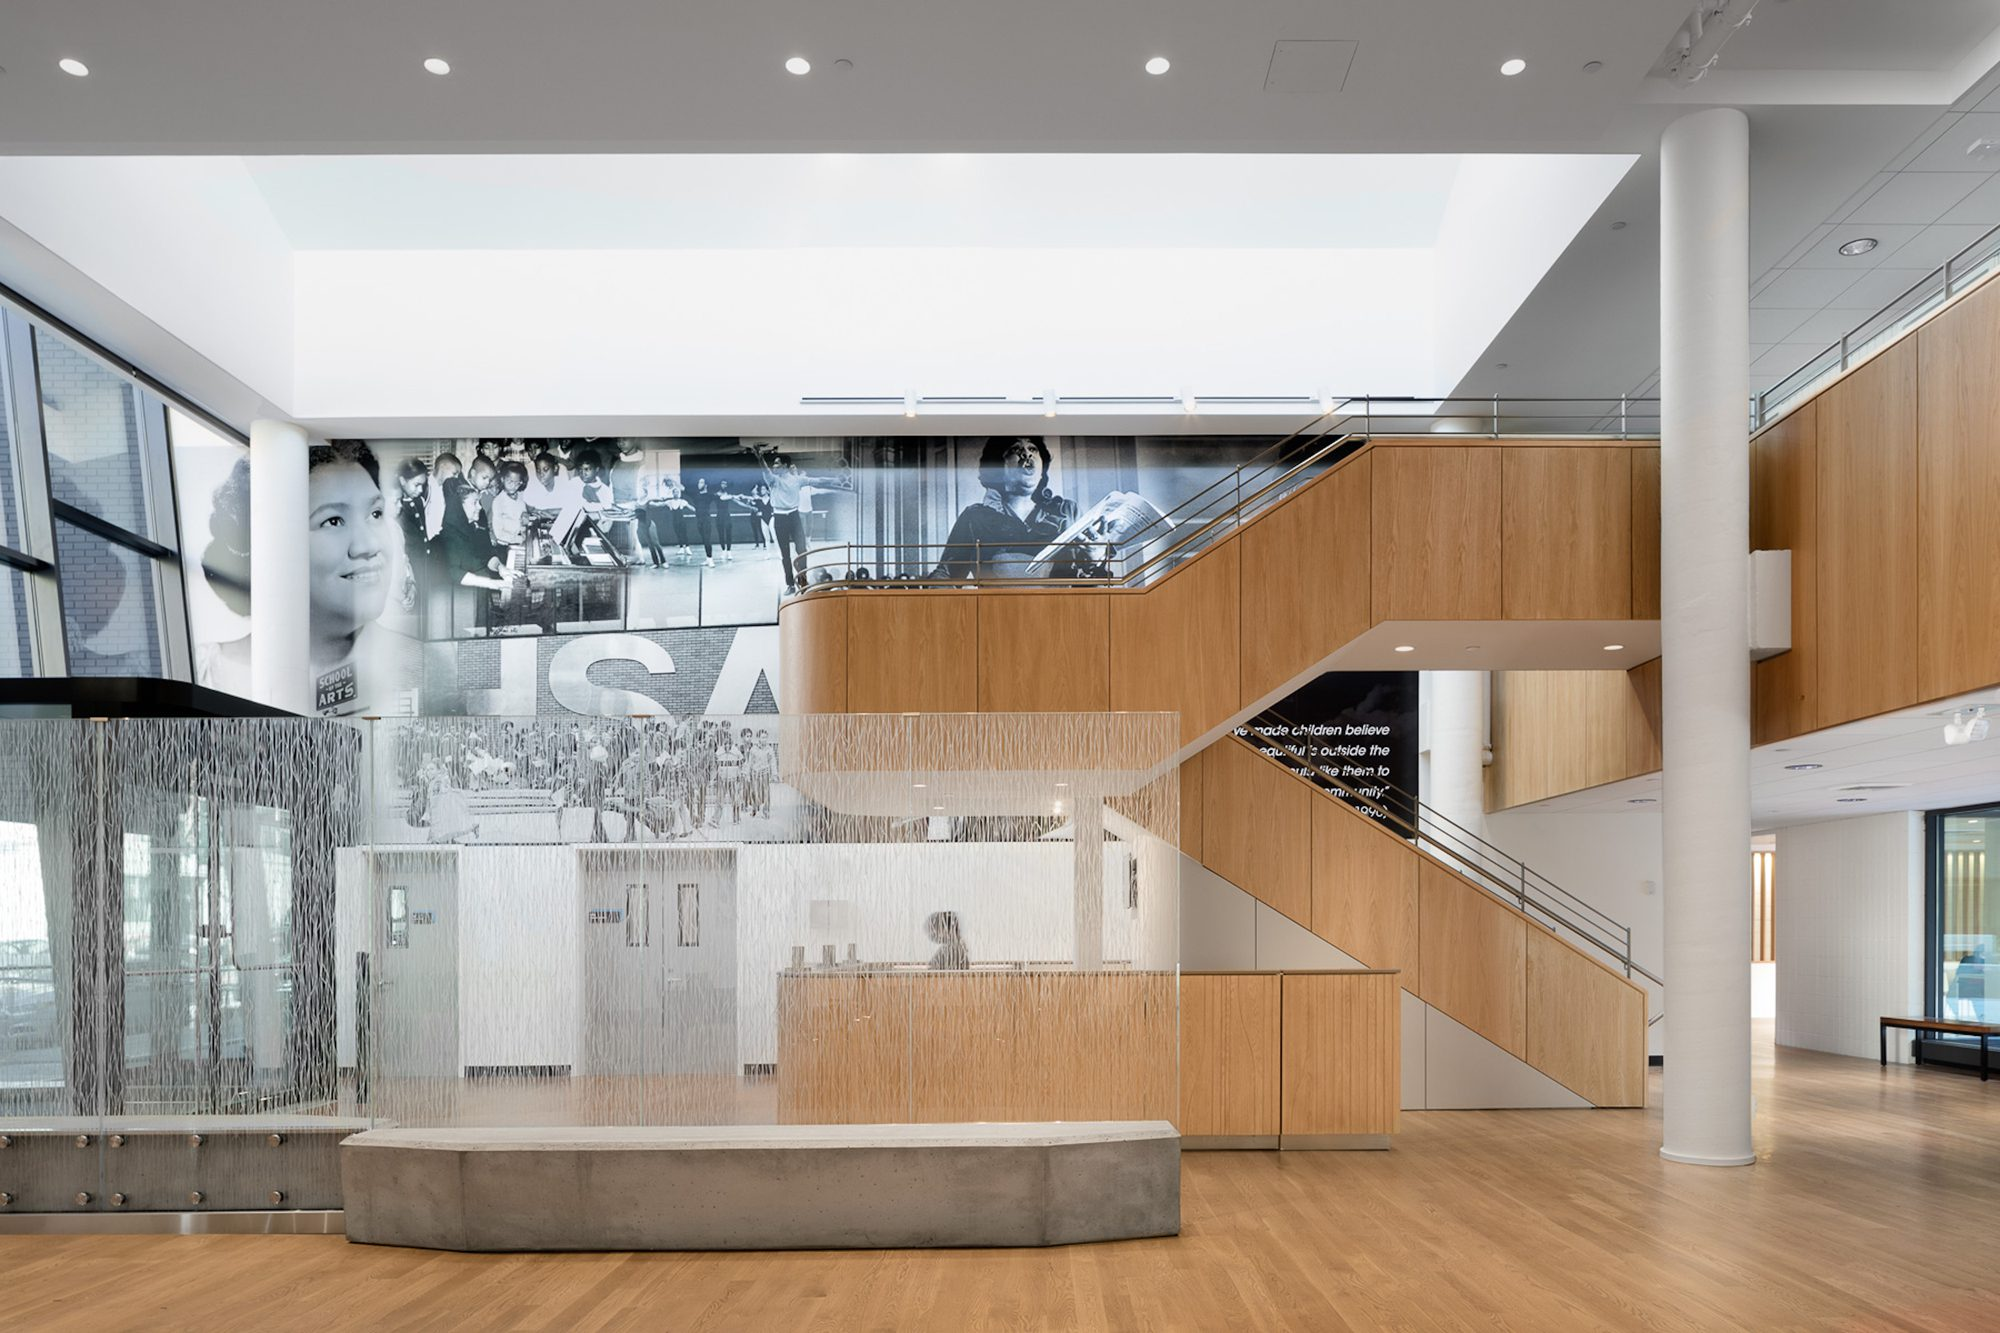 The Renaissance Project, Harlem School of the Arts, Herb Alpert Center